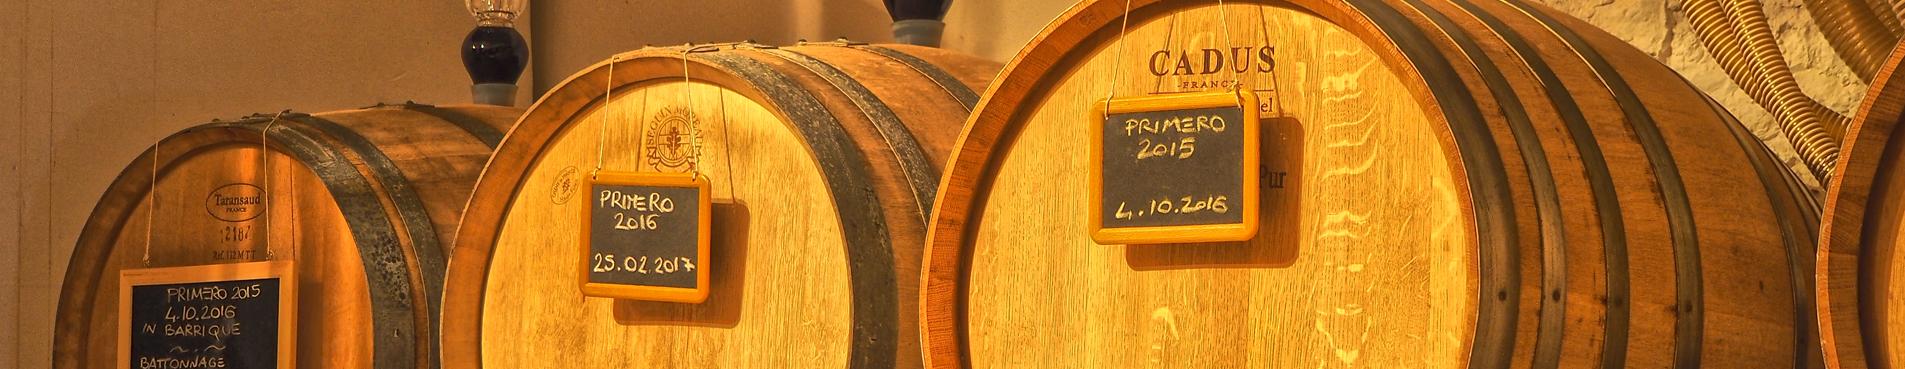 Produzione Vino Toscana